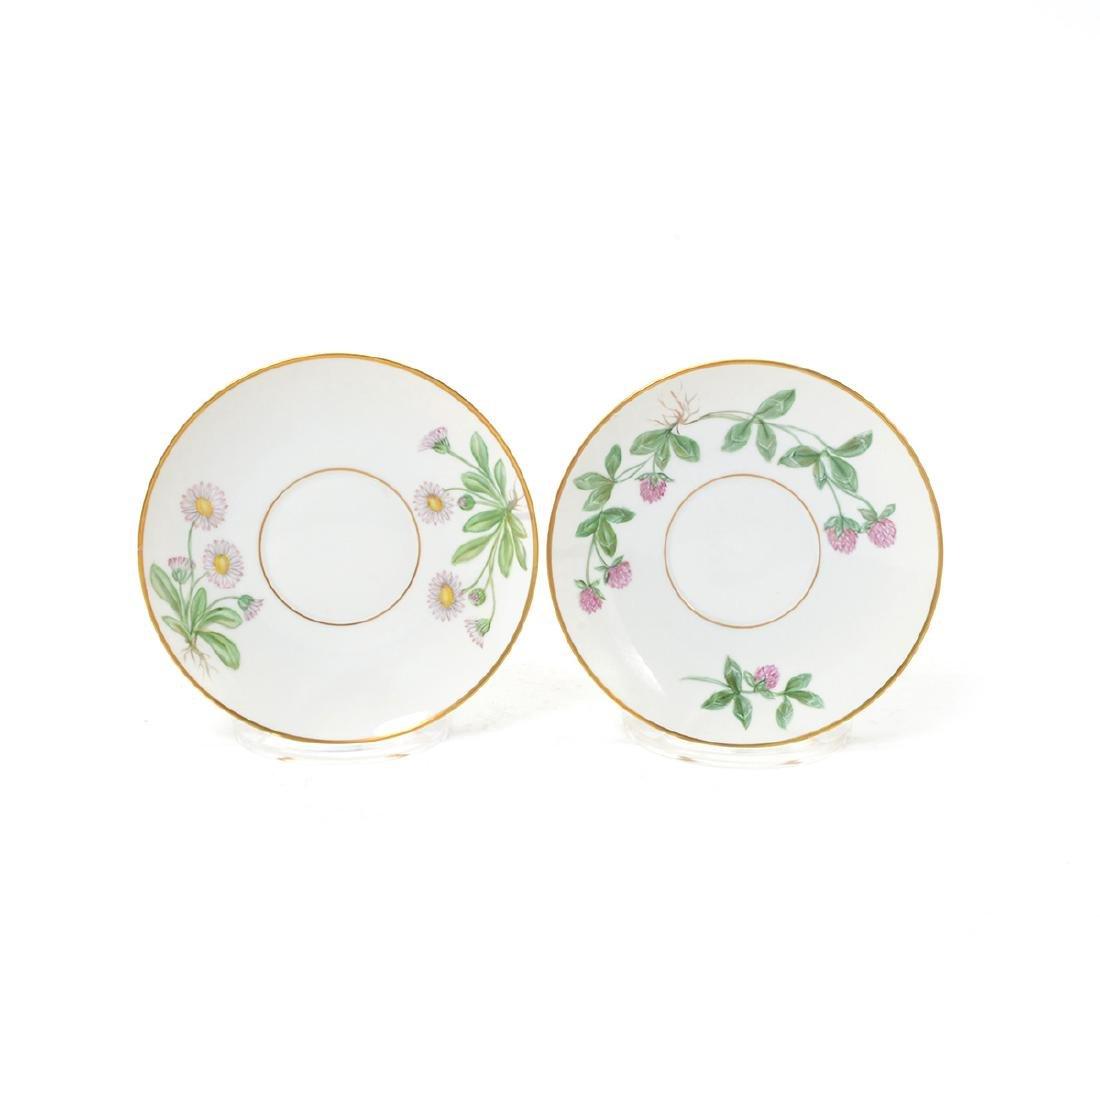 Royal Copenhagen Porcelain Serving and Table Articles - 6